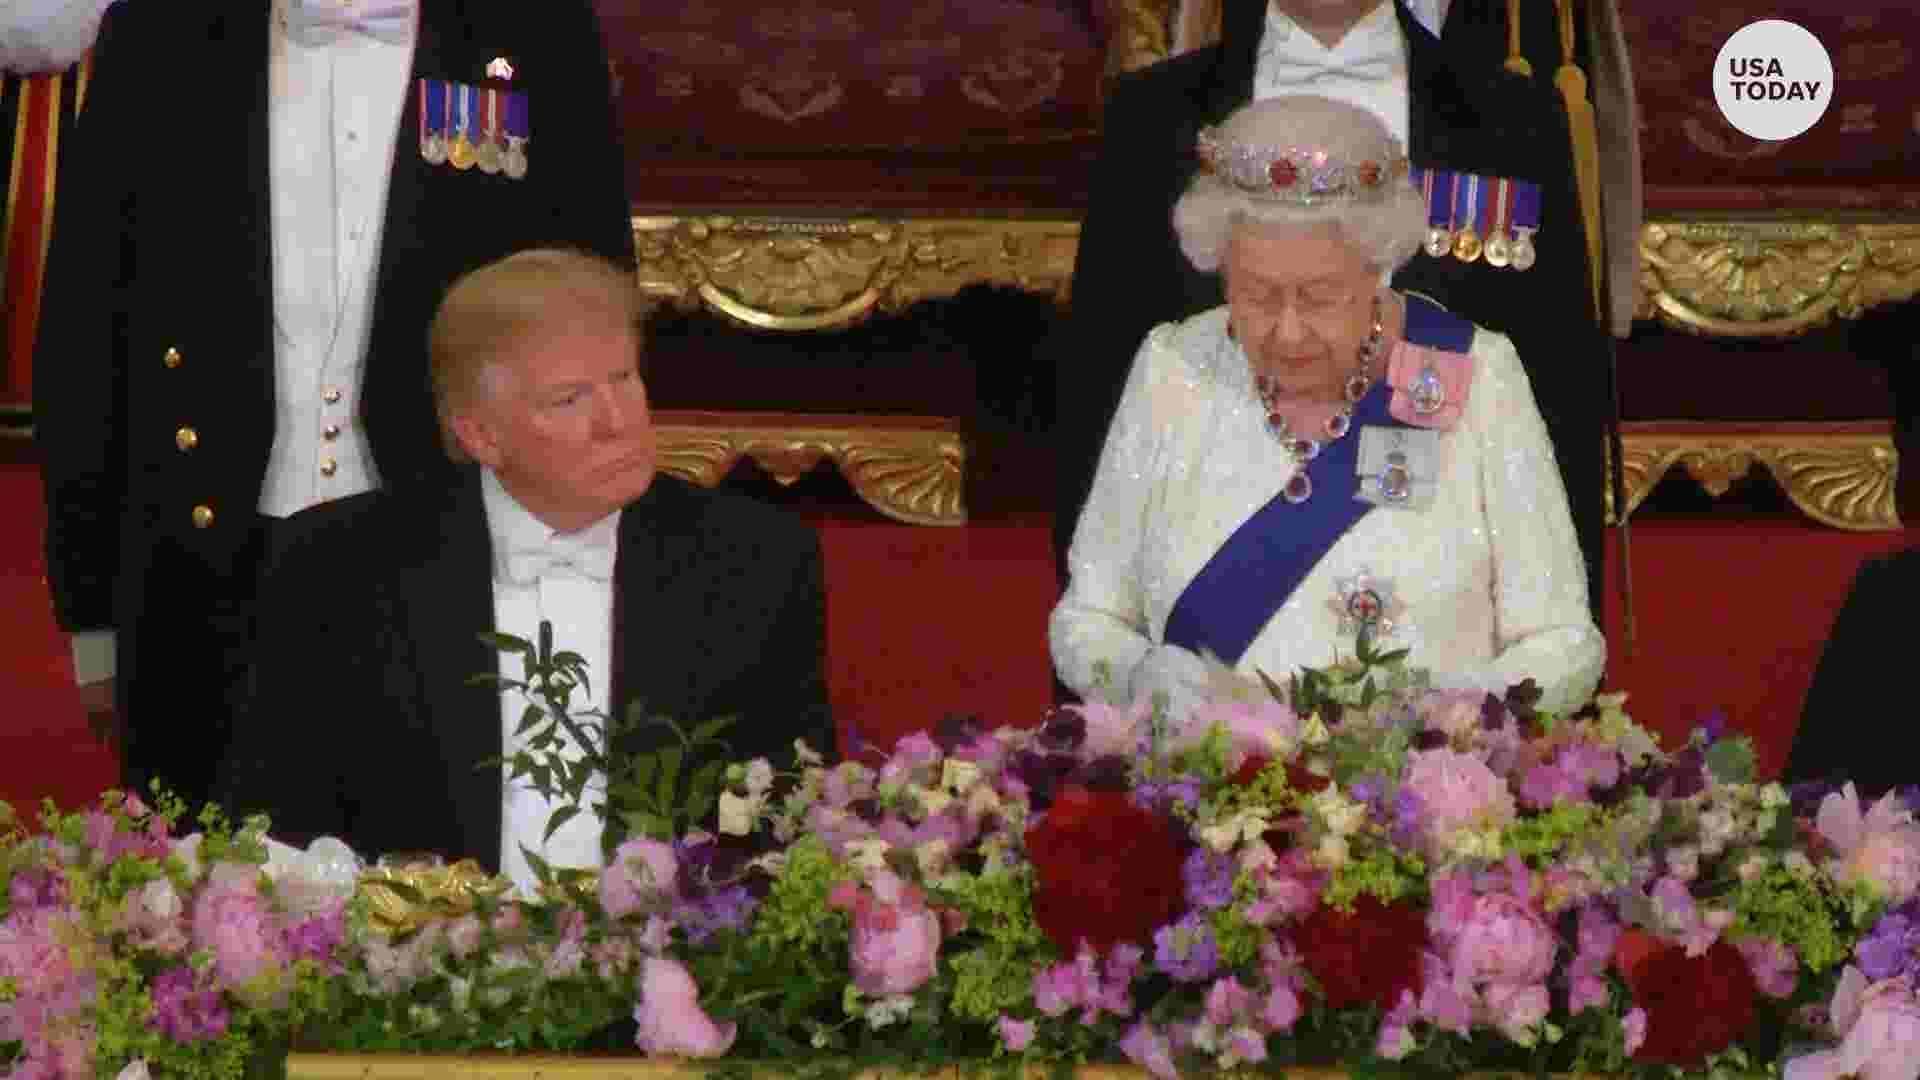 5a474af6b3469 Trump, Melania at Queen Elizabeth banquet; Prince William, Kate attend